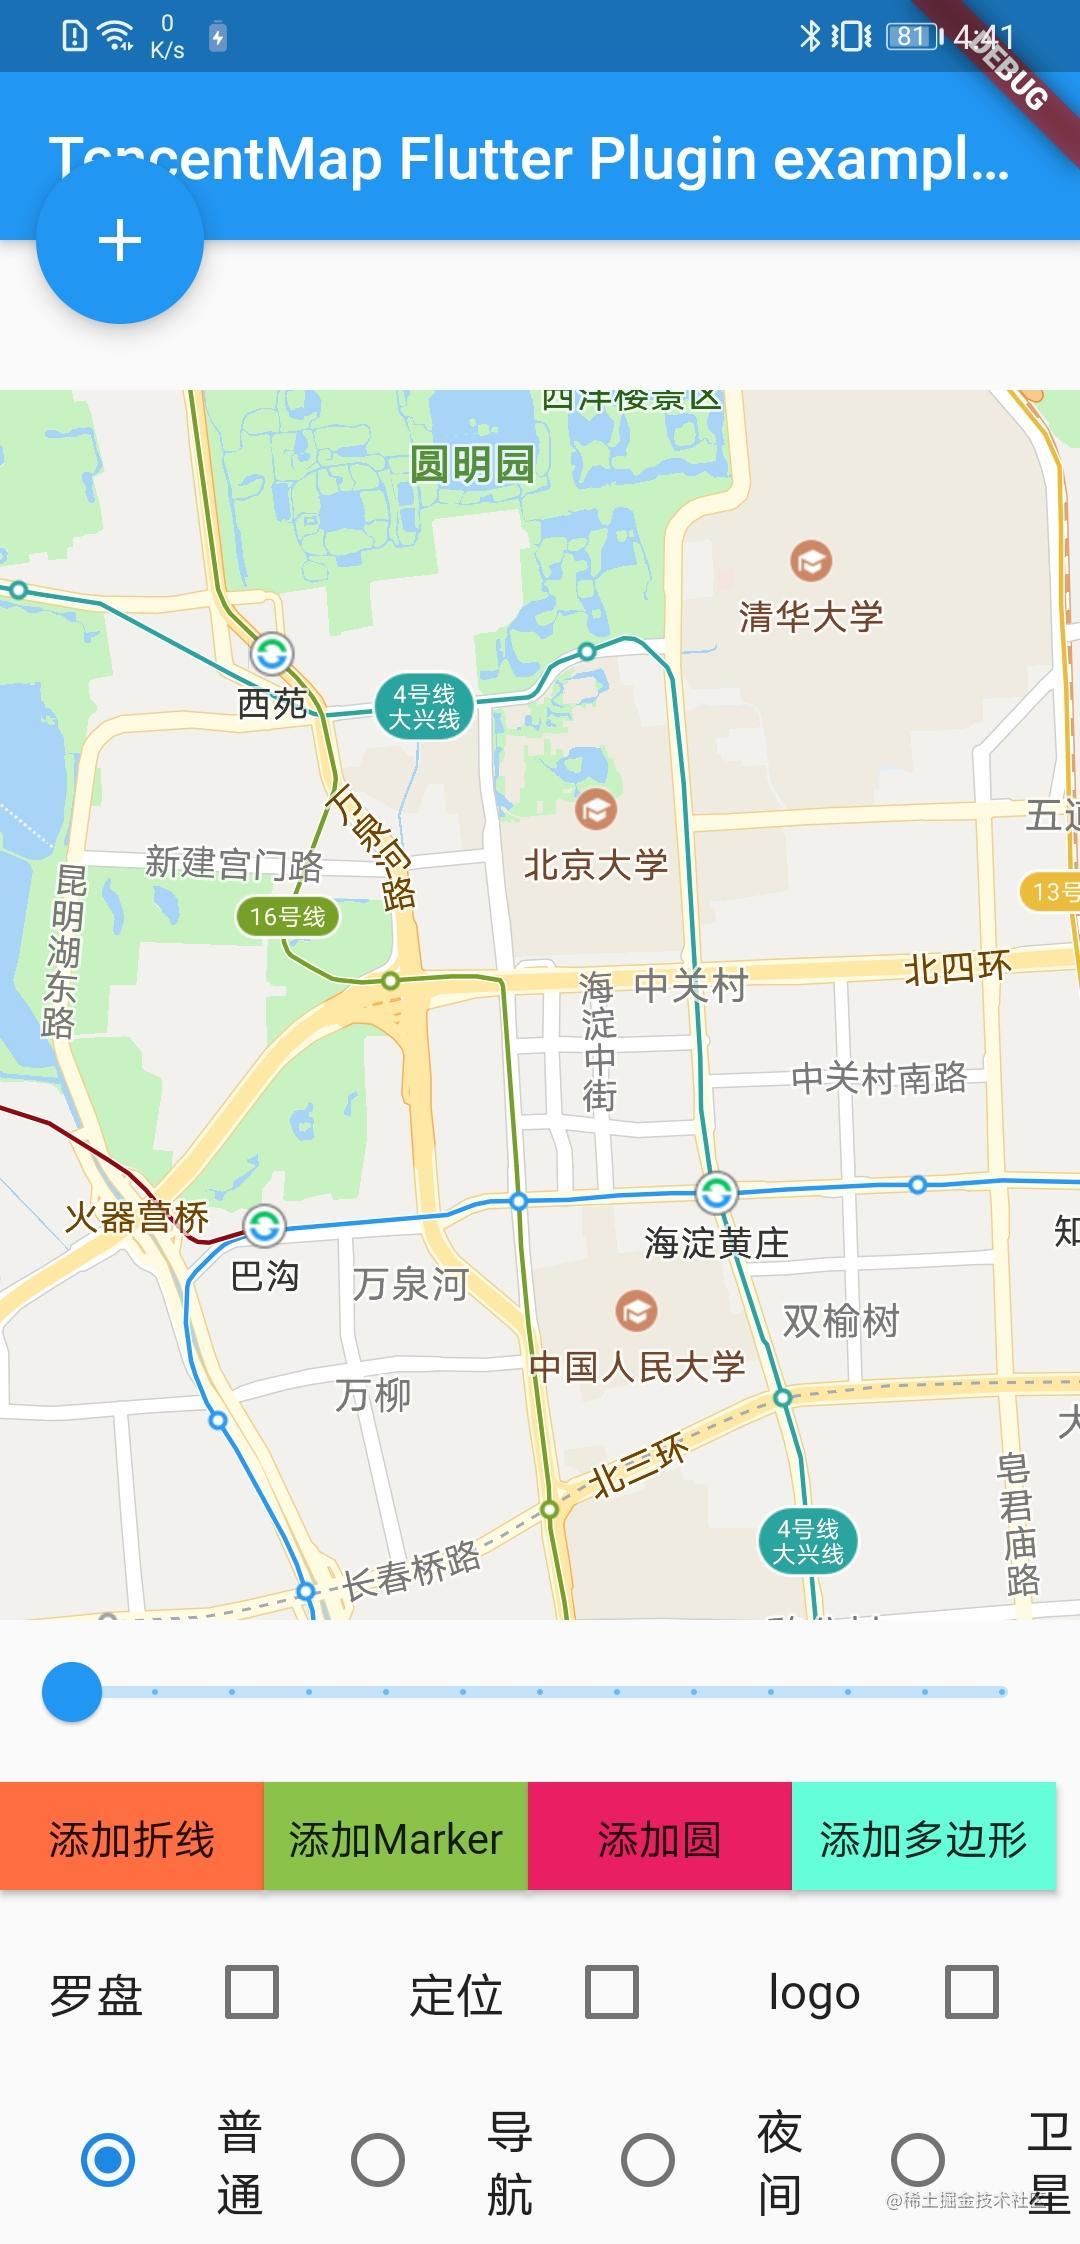 Screenshot_20210324_164152_com.tencent.tencentmap_example.jpg